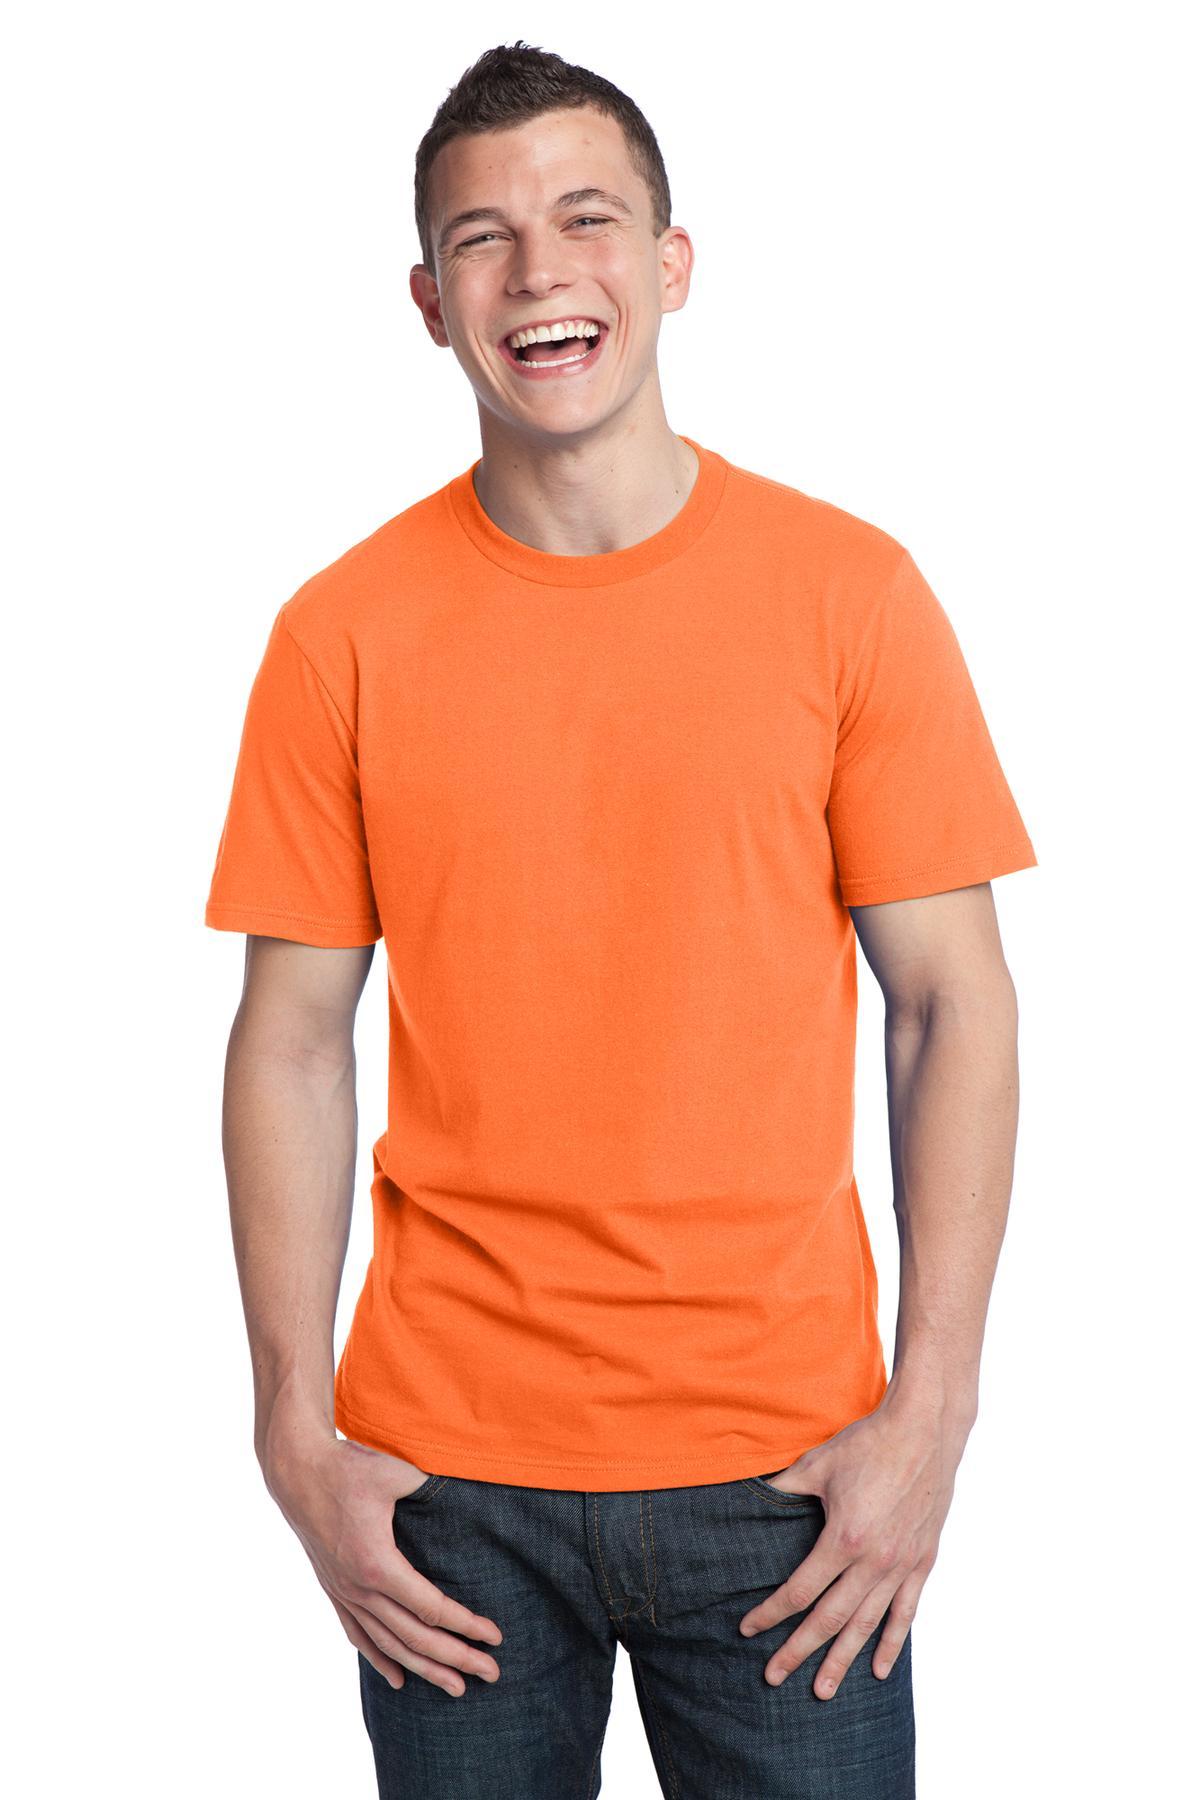 T-Shirts-100-Cotton-64